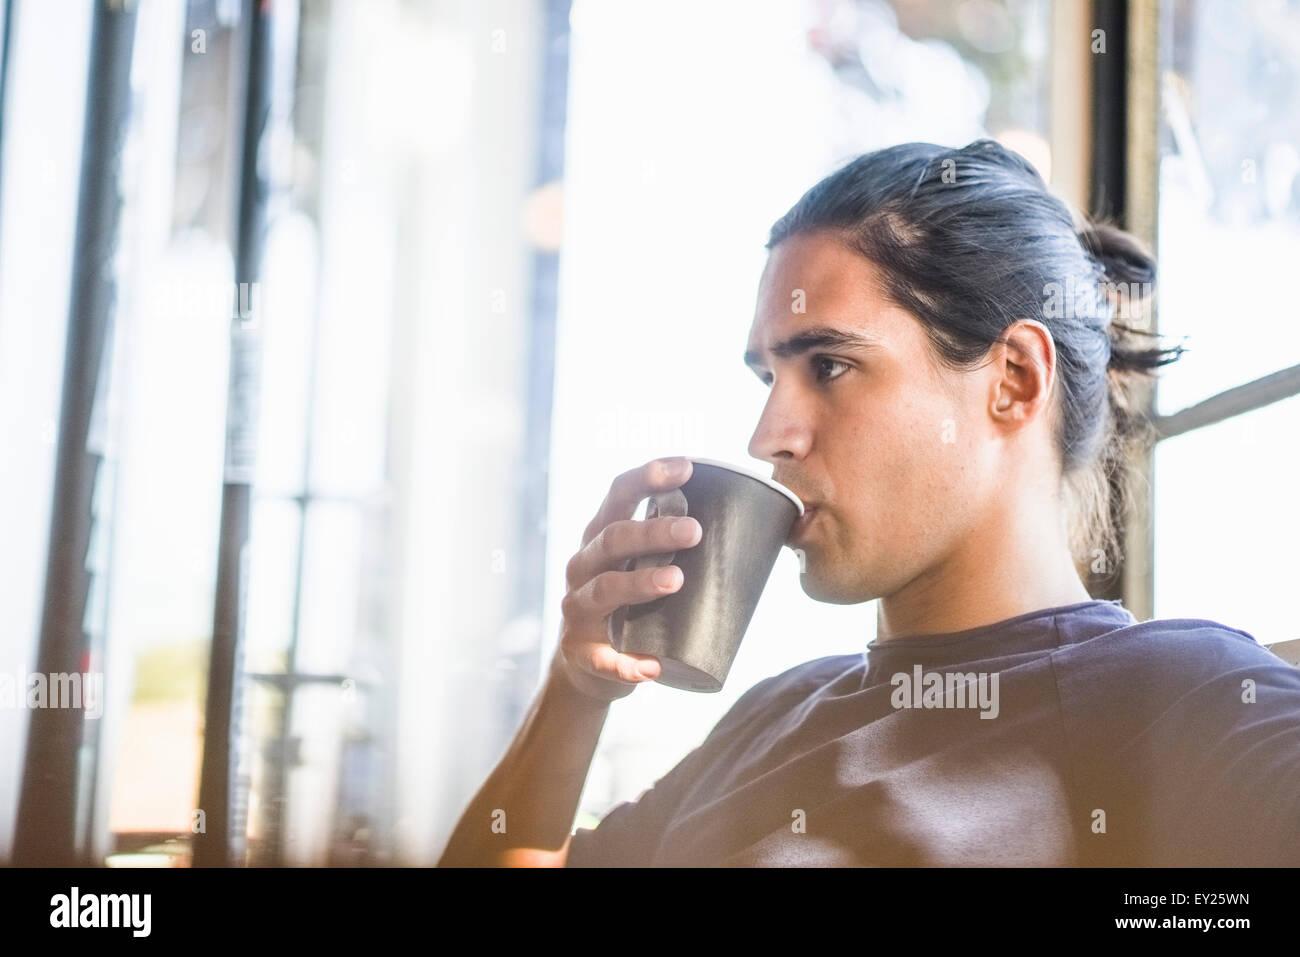 Junger Mann, Kaffee trinken, drinnen Stockbild